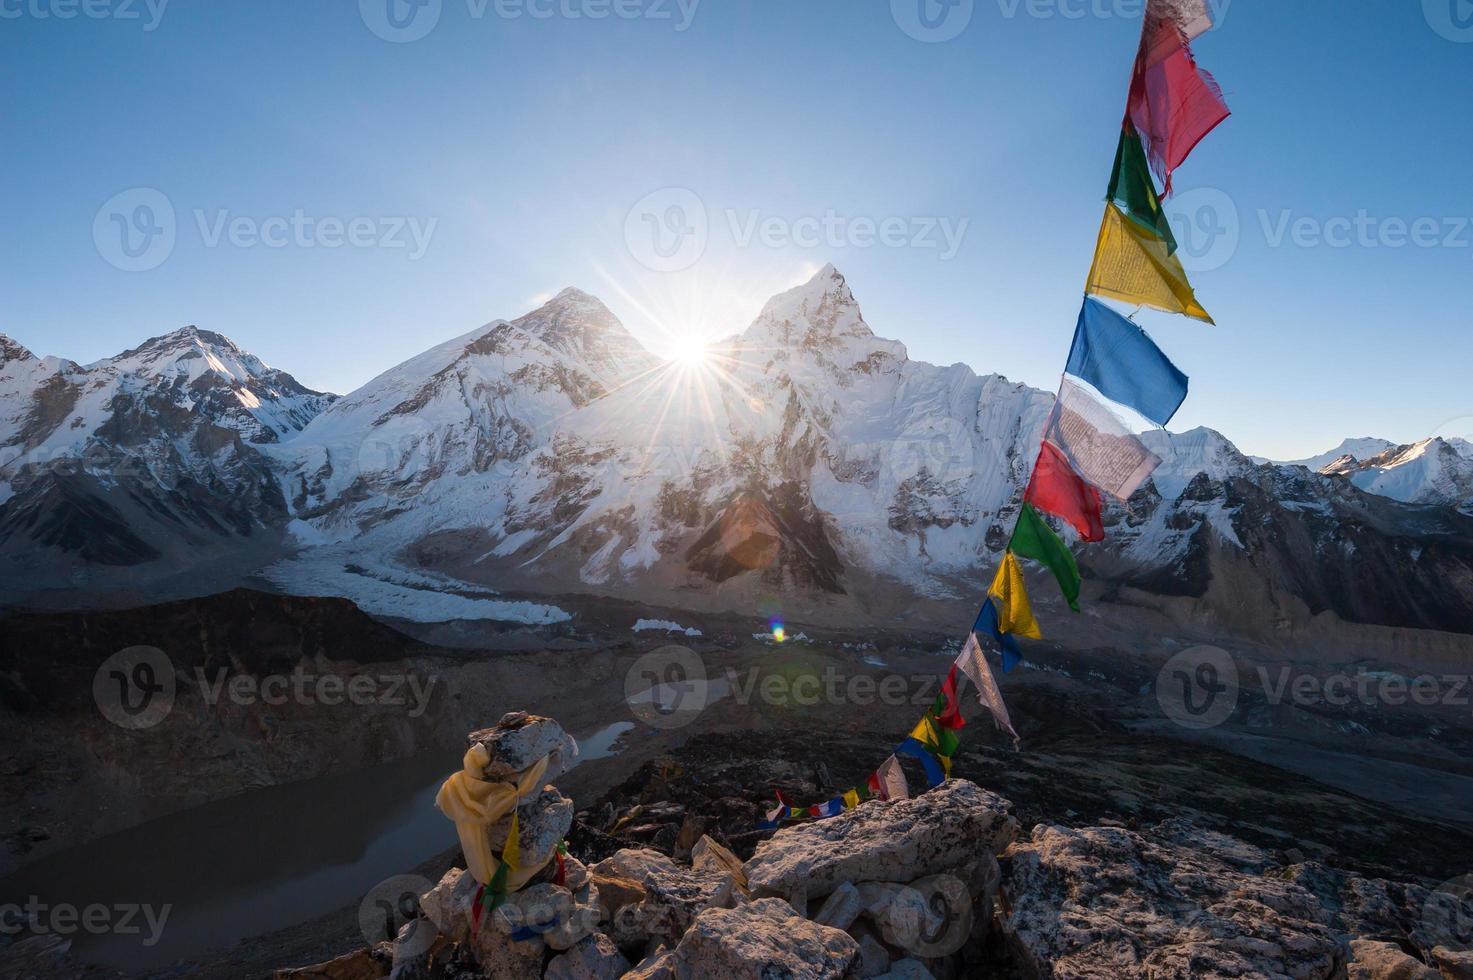 mt. everest all'alba dal vertice di kala patthar, nepal foto